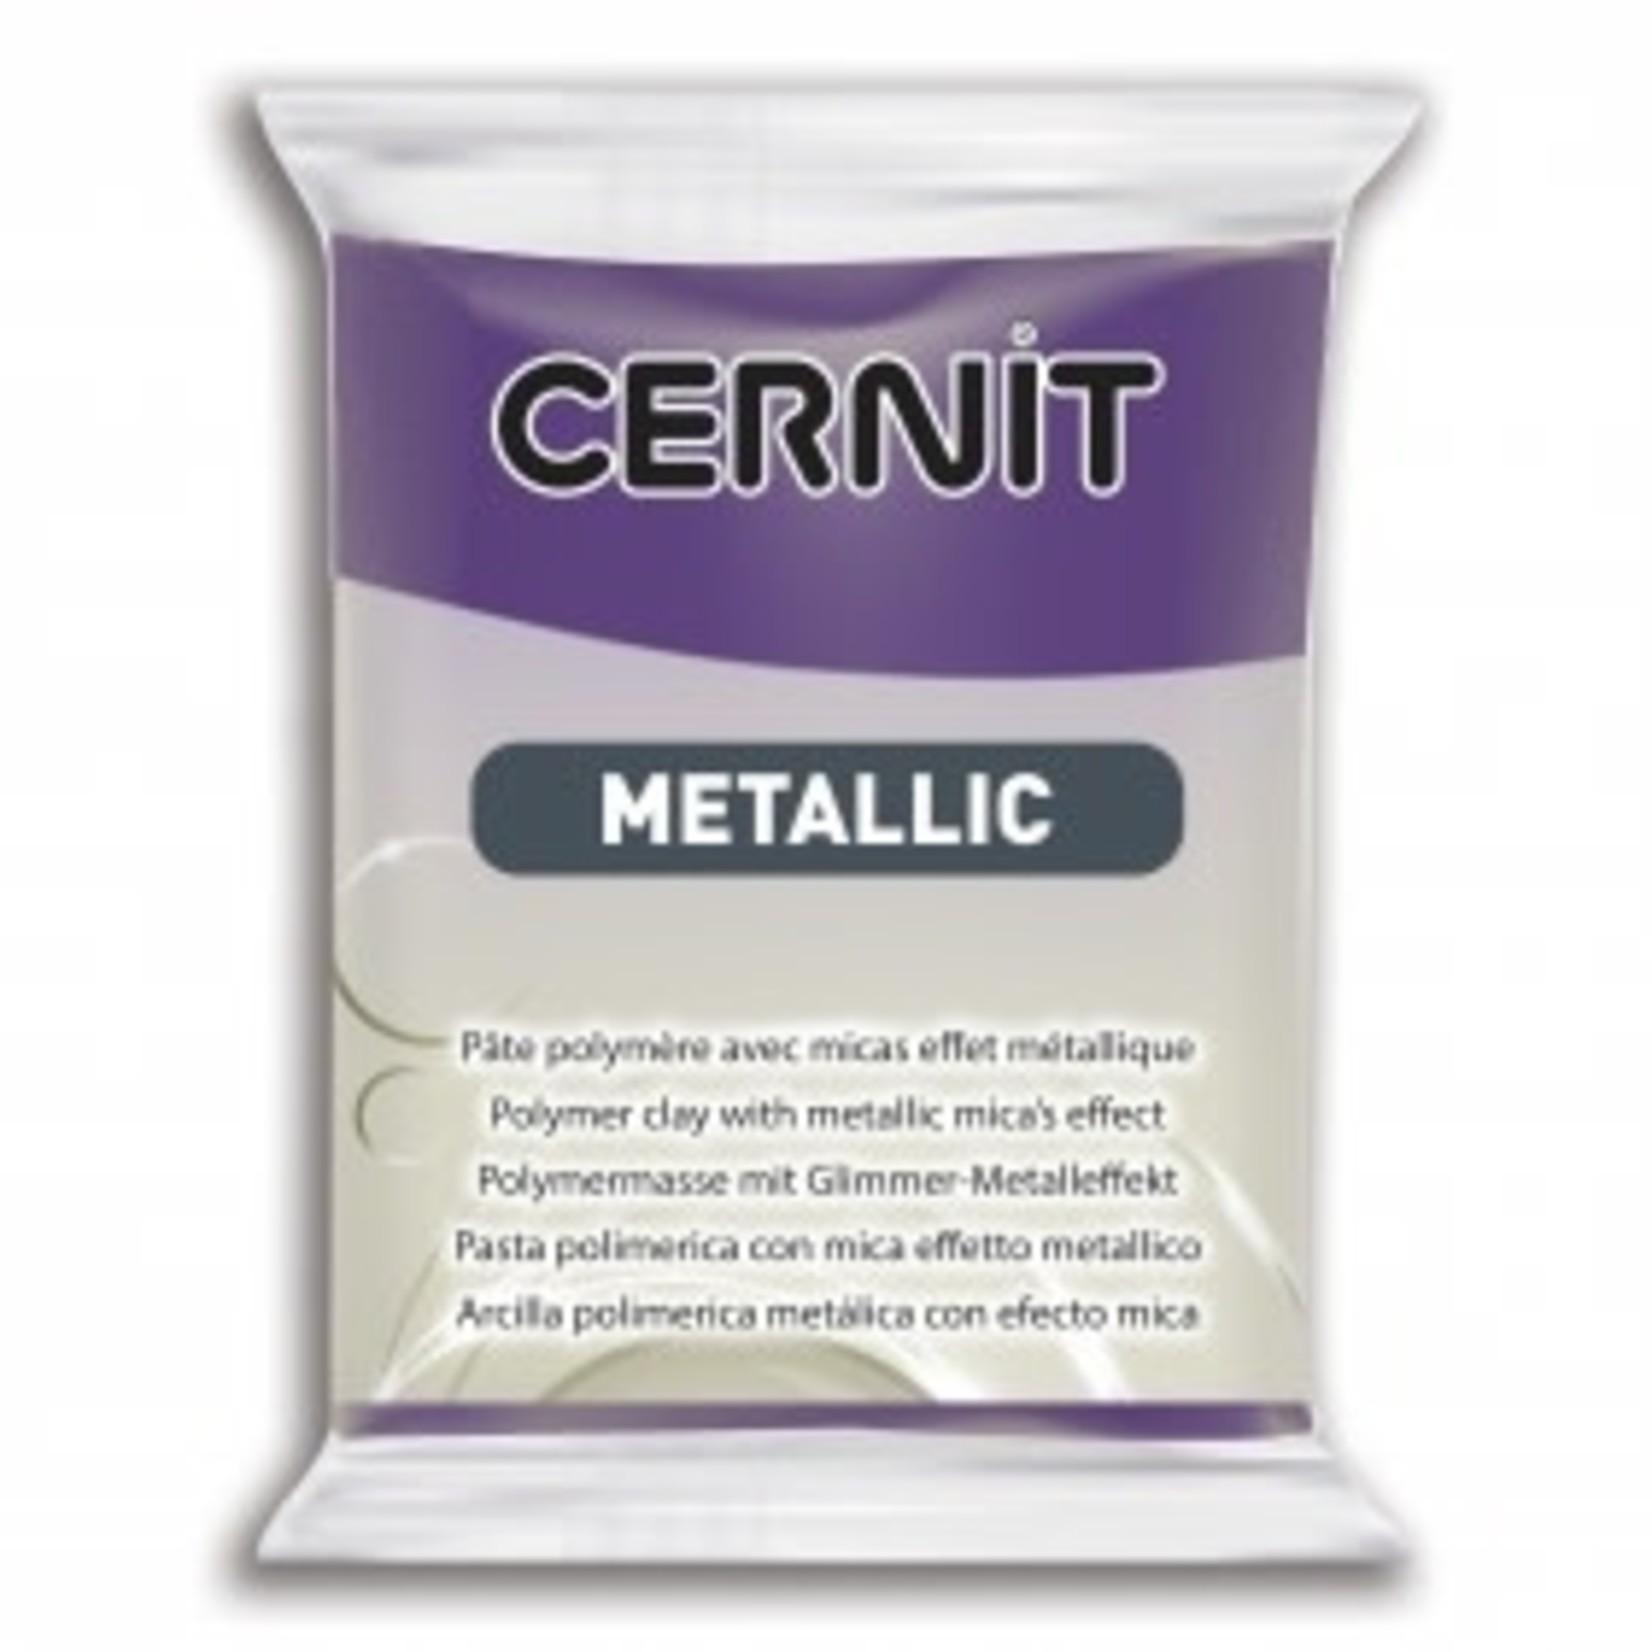 Cernit Cernit Metallic 56g Violet